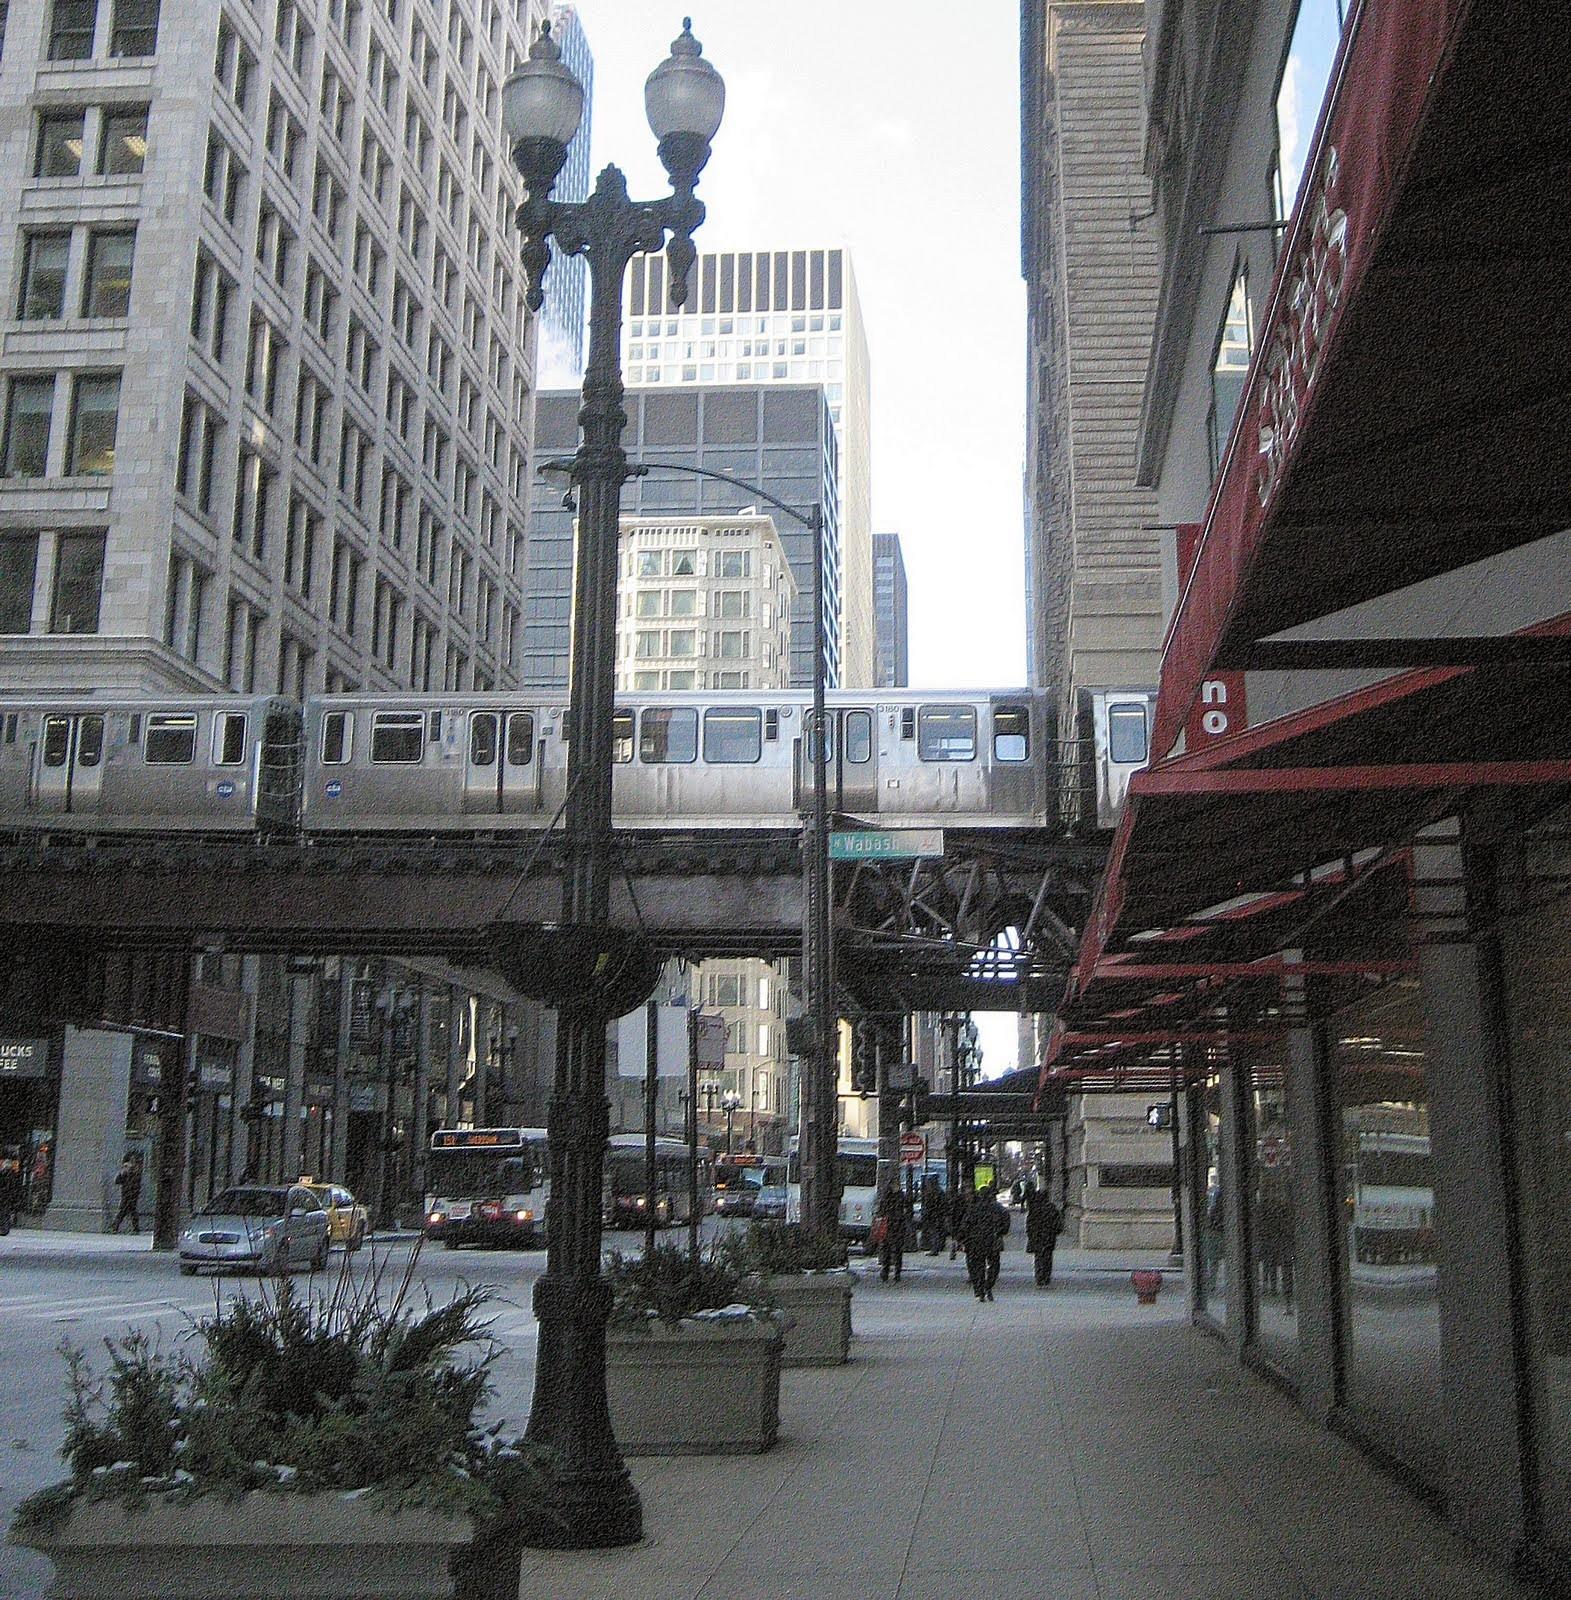 http://3.bp.blogspot.com/-i9dtVU5U4ng/TeVQWNhTzKI/AAAAAAAAFzk/rZuLo9Wn6tg/s1600/Chicago%20public%20transits.JPG